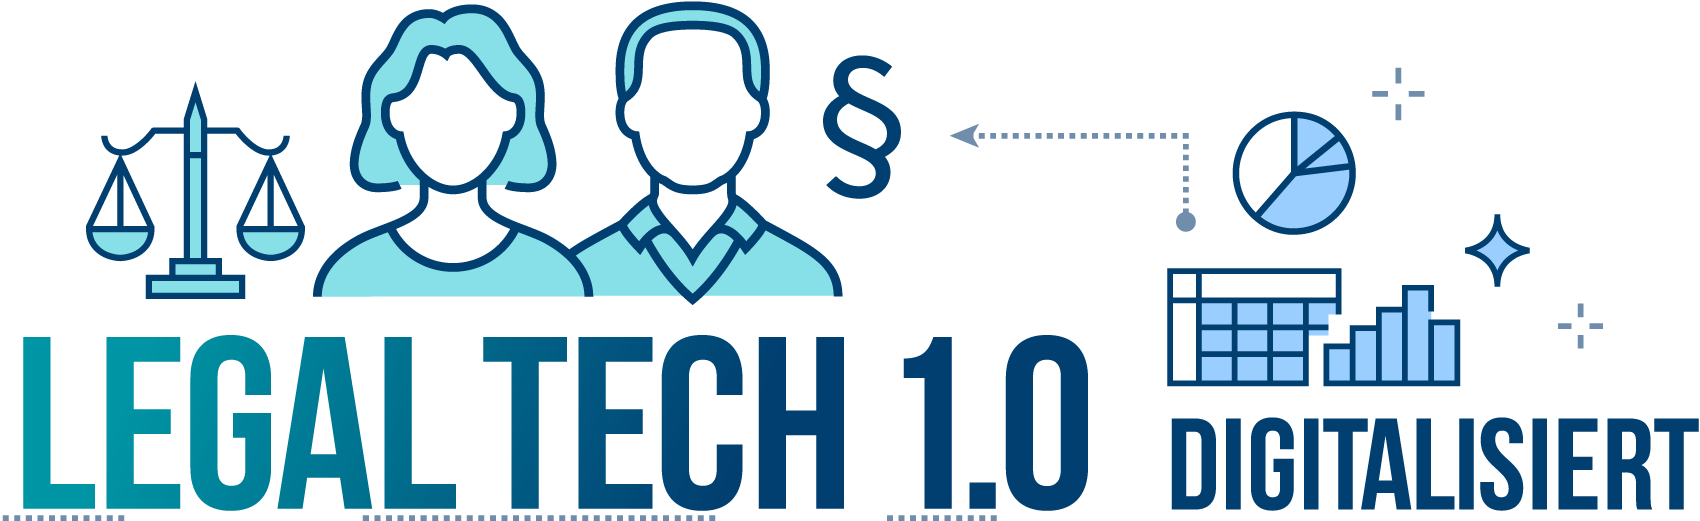 LegalTech_1.0_digitalisiert